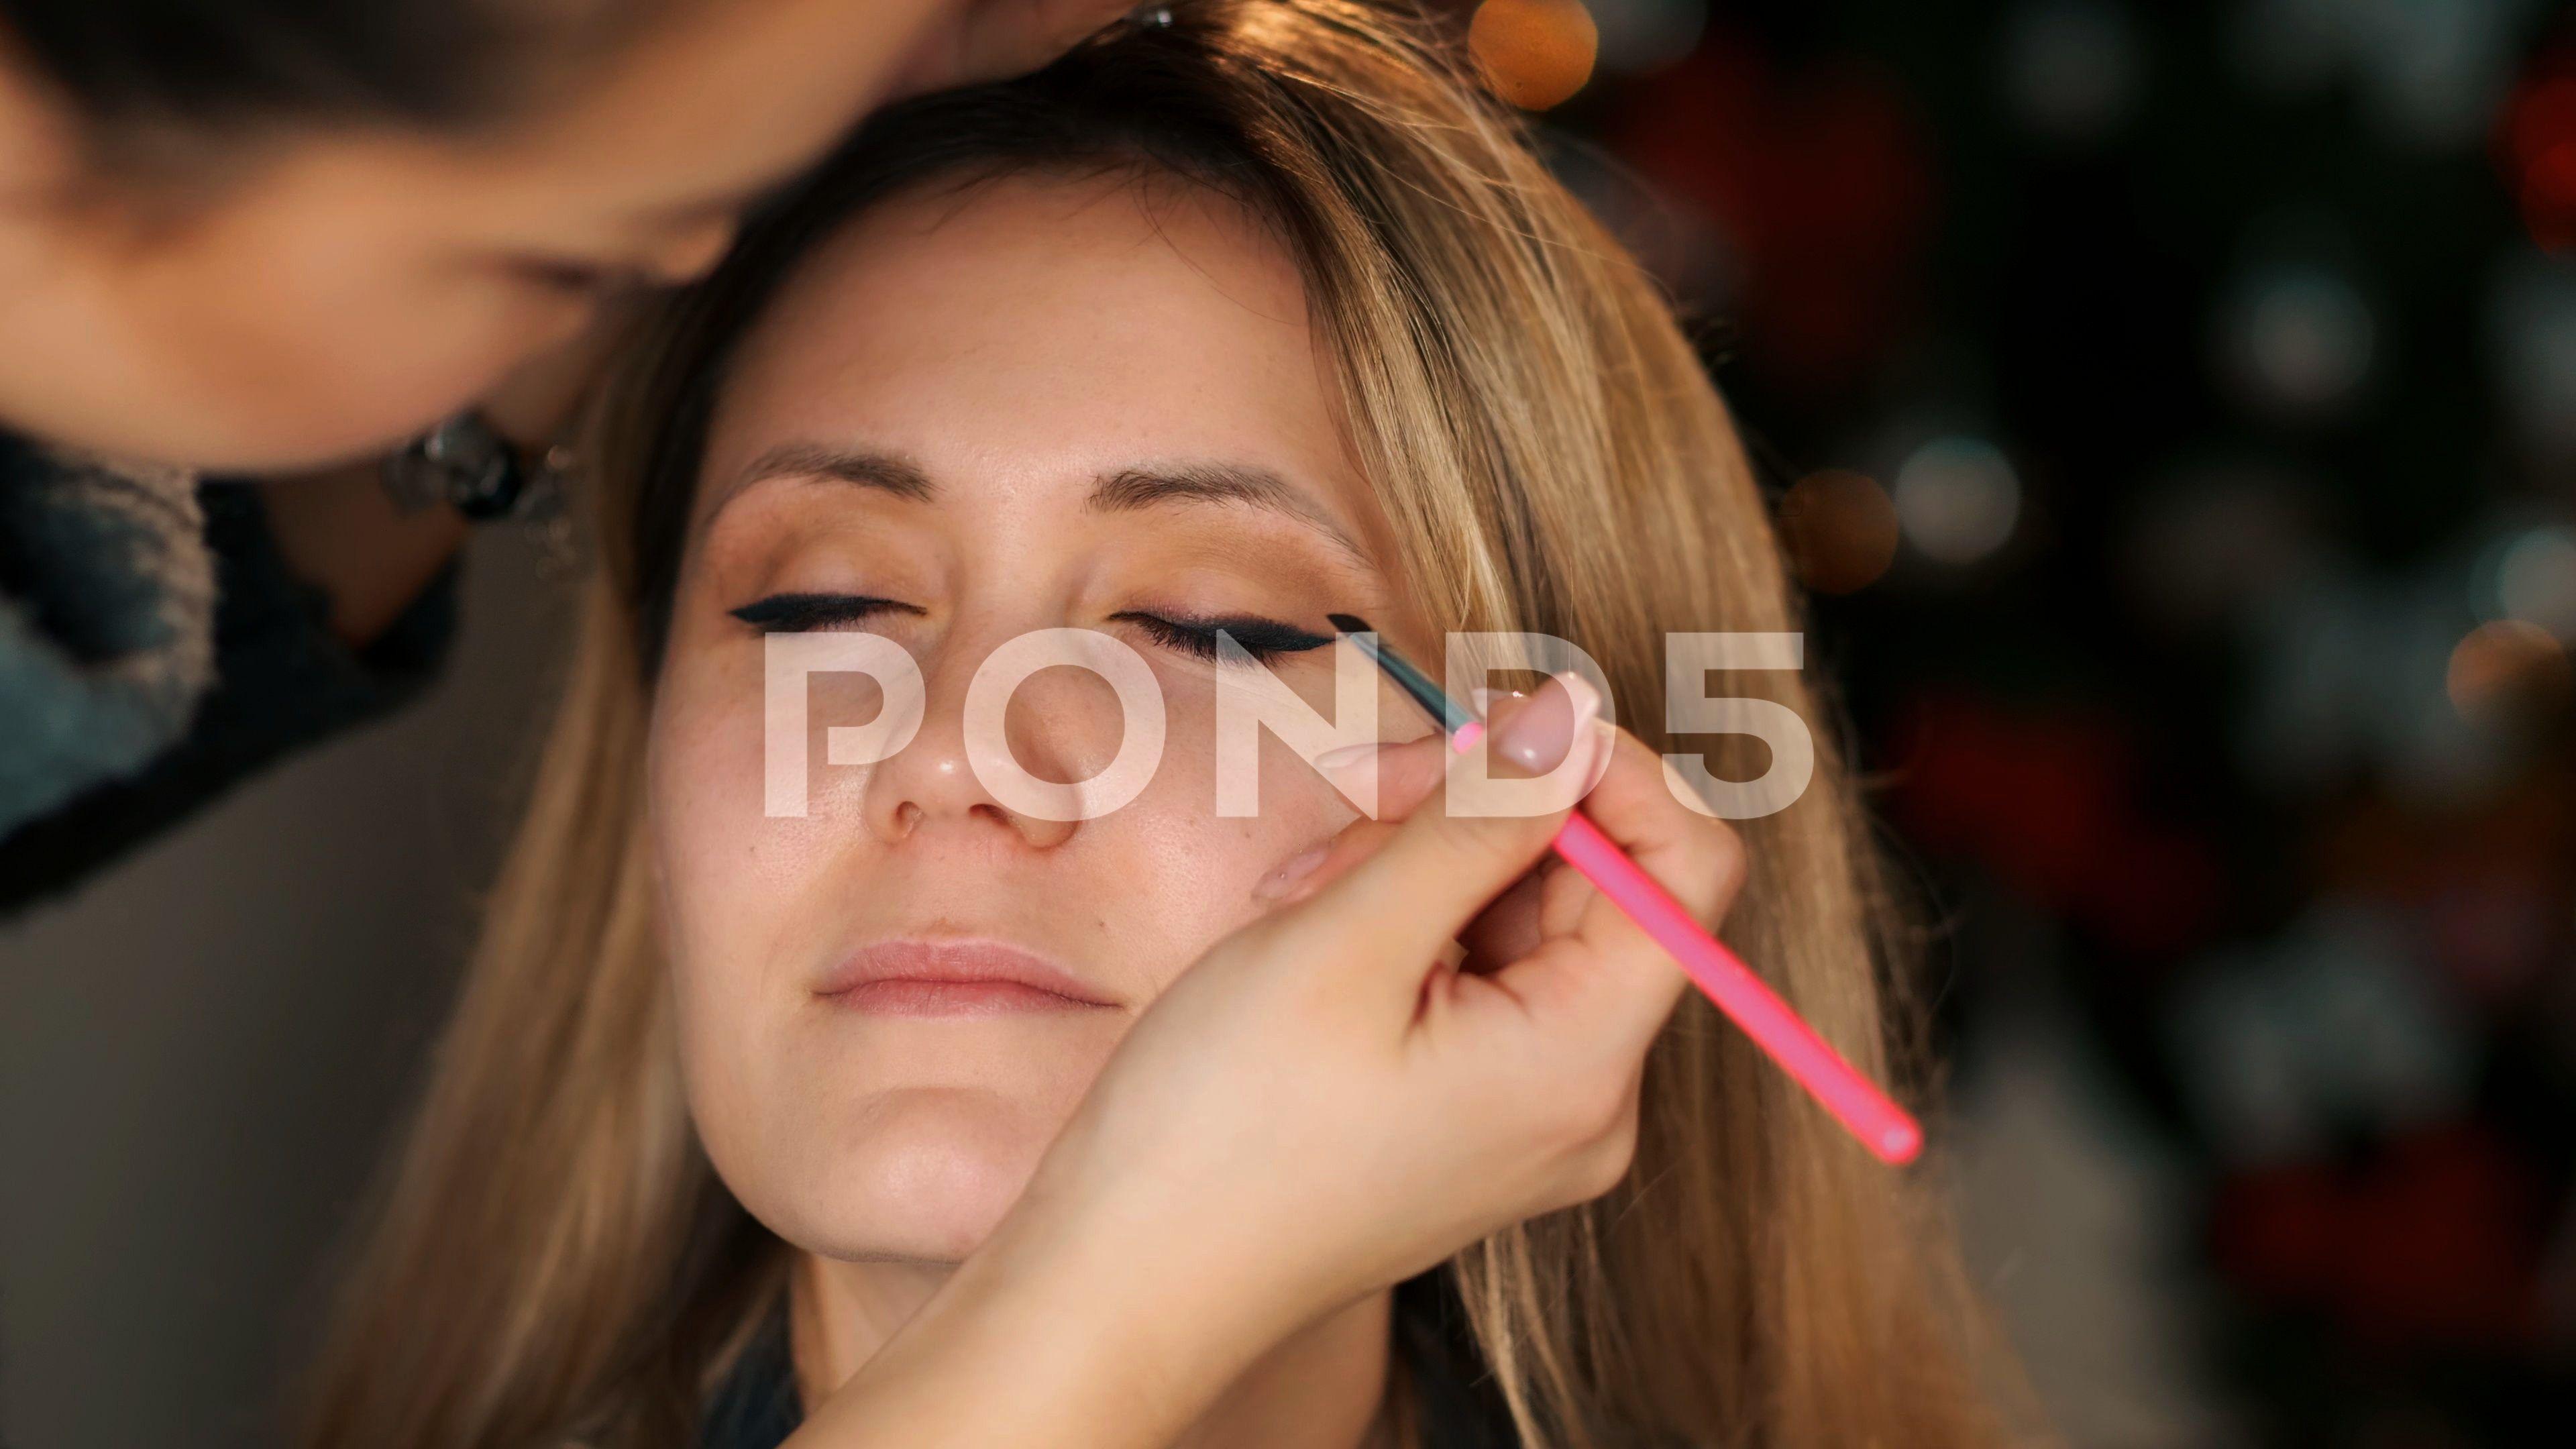 make up artist applying eyeliner close-up on model eye. Cosmetic Stock Footage ,#eyeliner#close#app